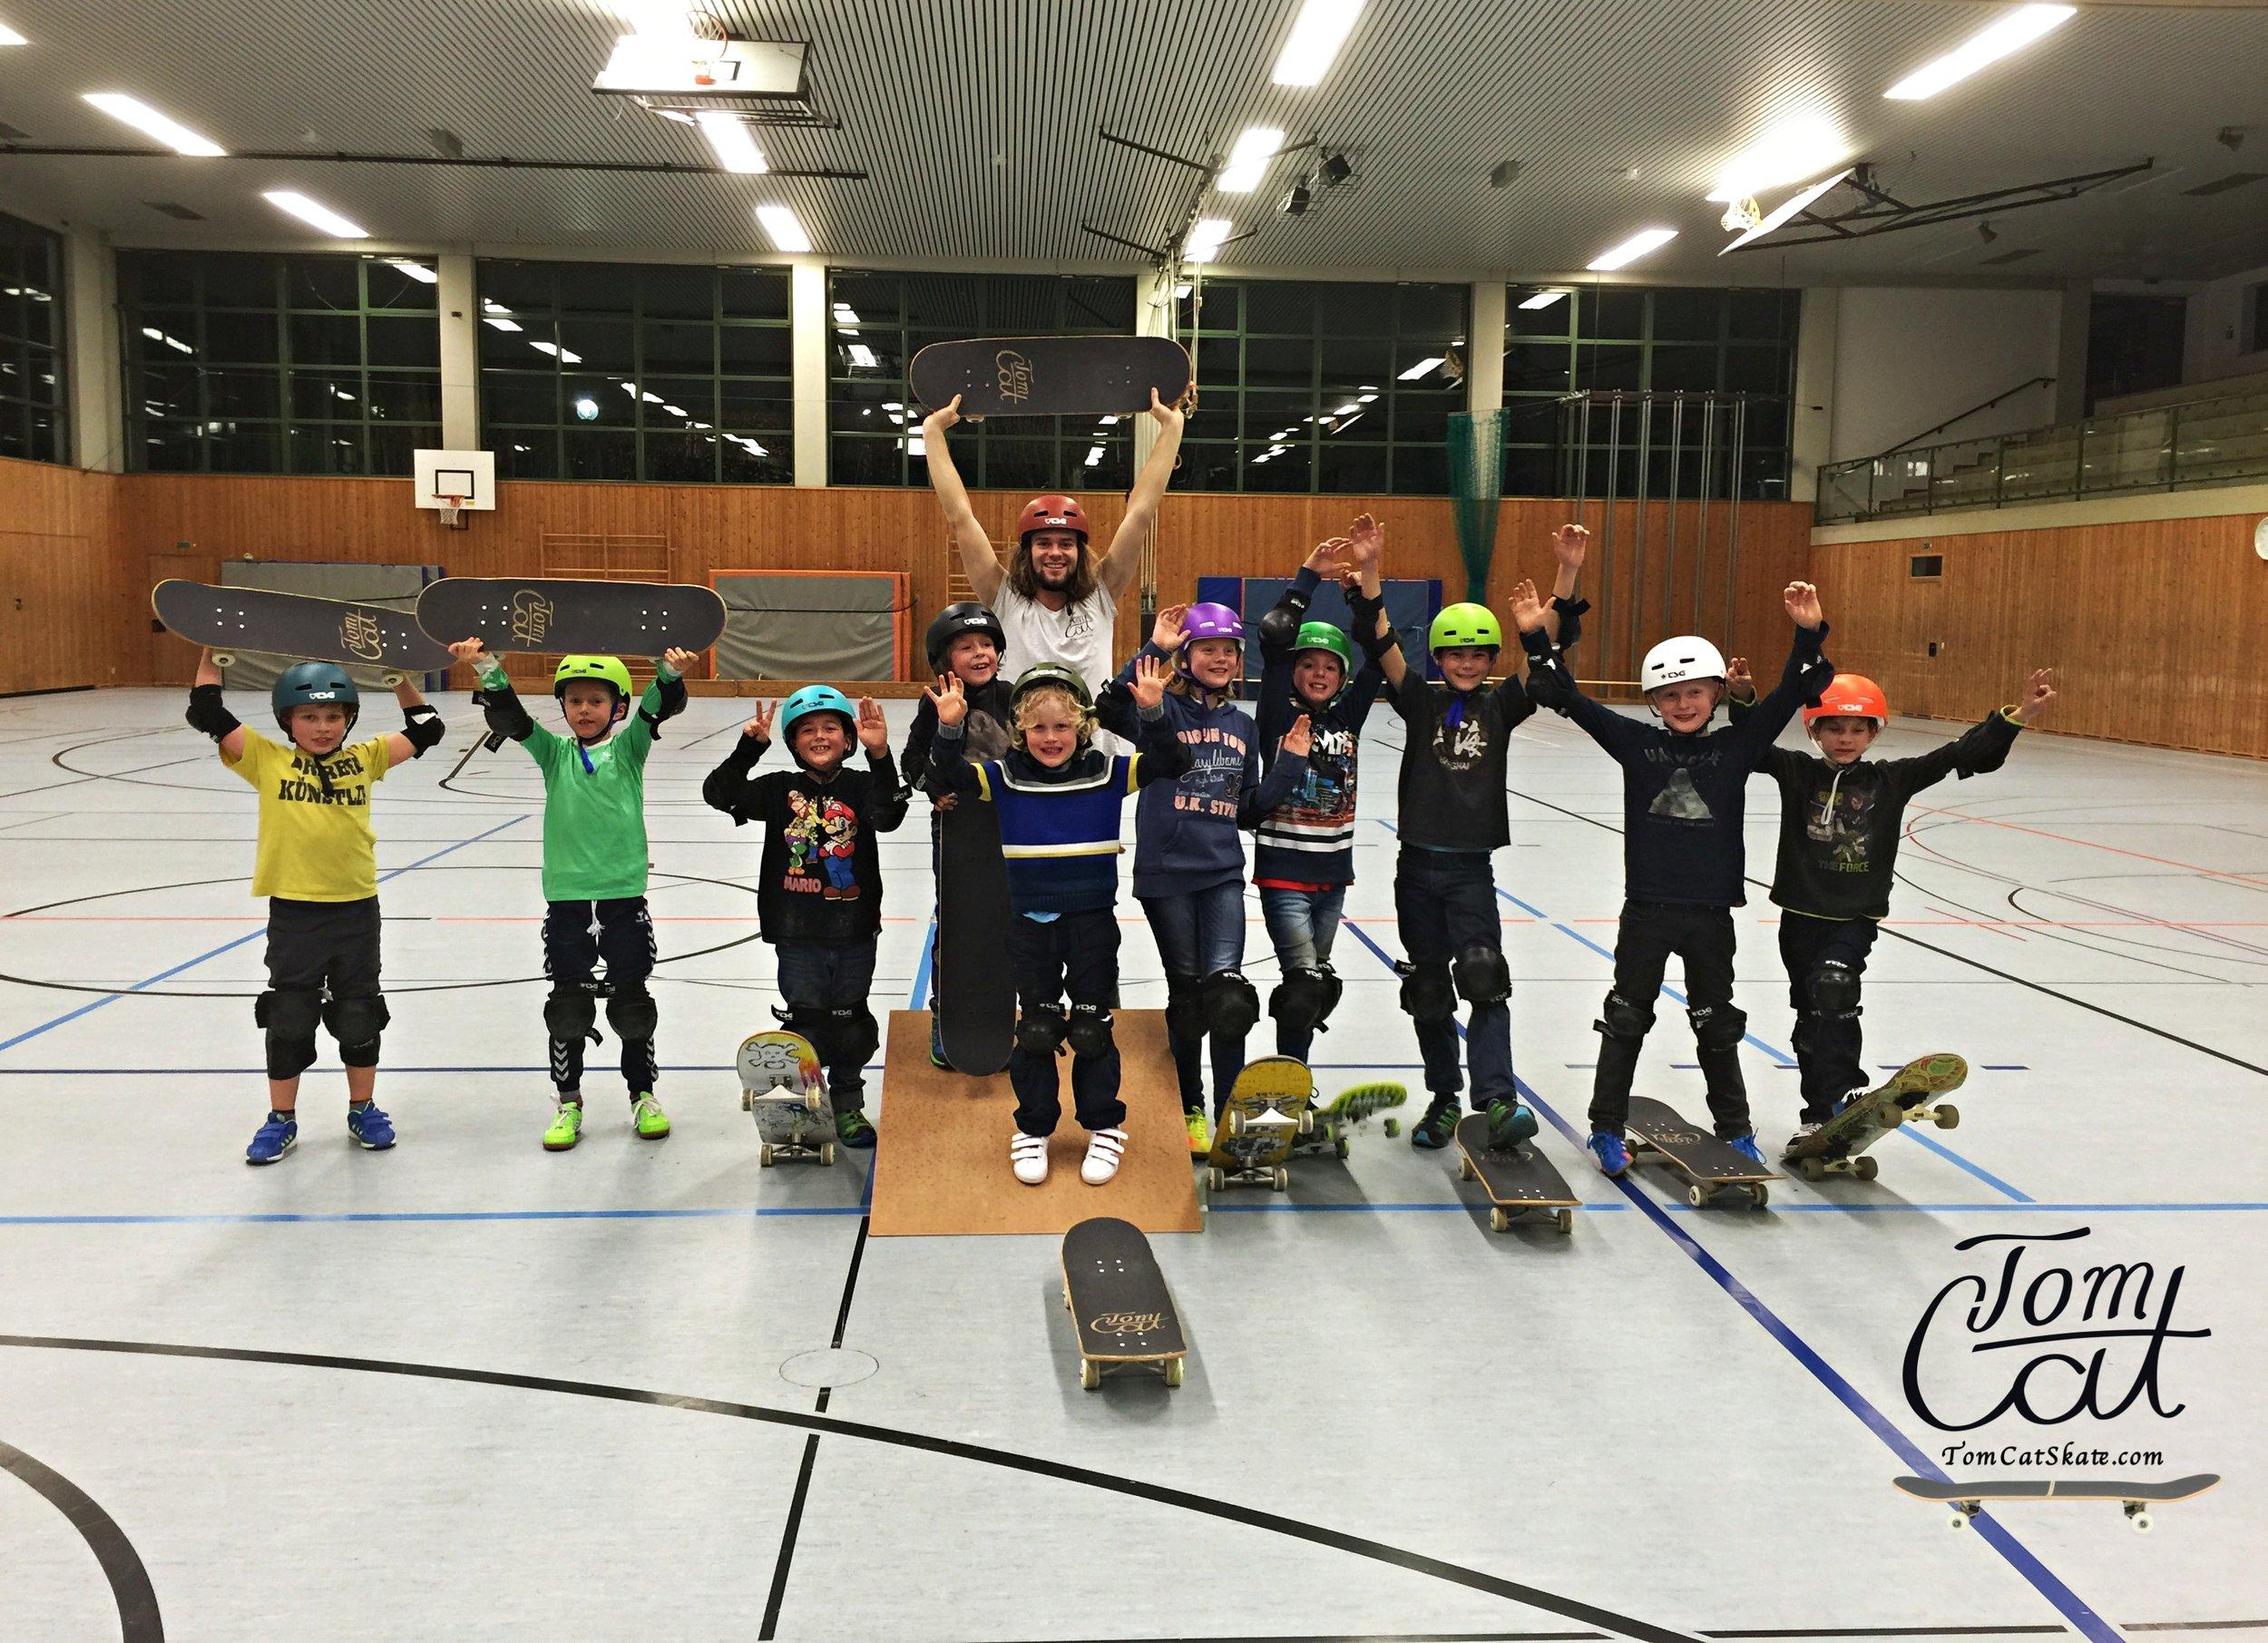 Kinder Geburtstagsfeier Bad Tölz, Lenggries, München Landsberg, Holzkirchen, Tegernseer, GrünwaldSkatekurs-München-Bad-Tölz-Skaten-lernen-München-Skateboard-fahren-lernen-skateboardkurs-für-Anfänger-TomCatSkate.com 2.JPG